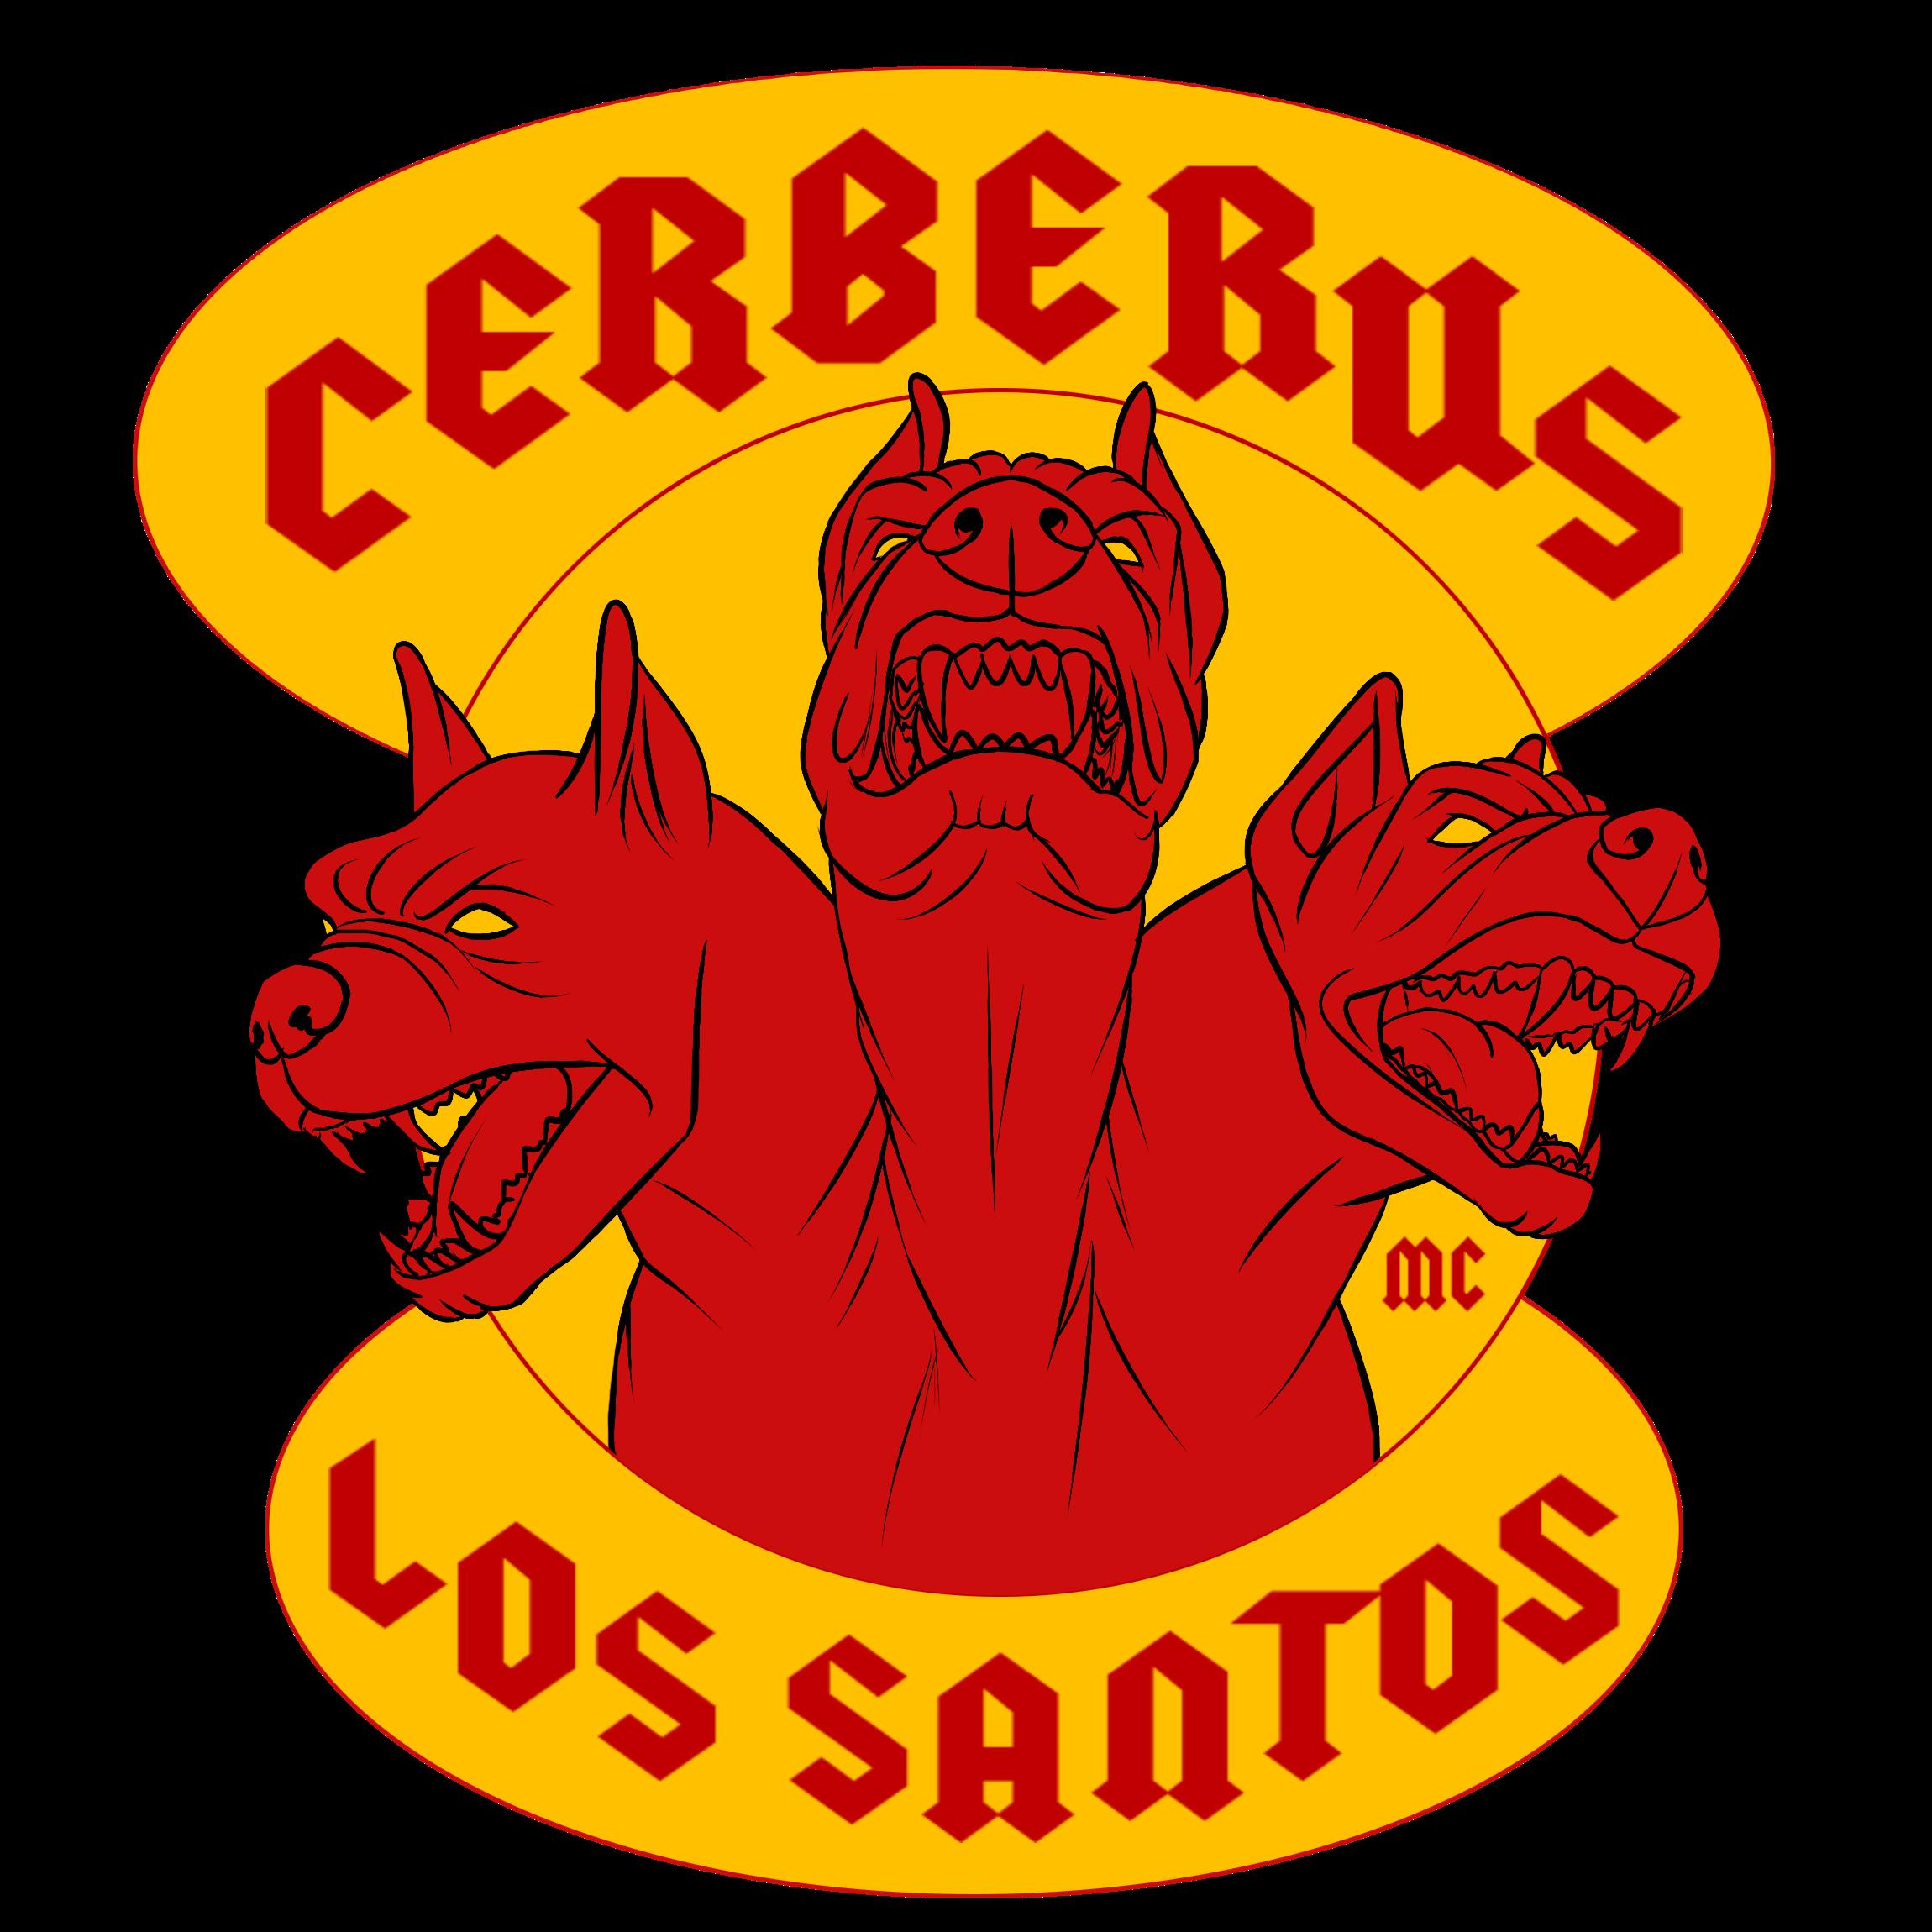 cerberus_logo_by_just_sora-db8081e.png